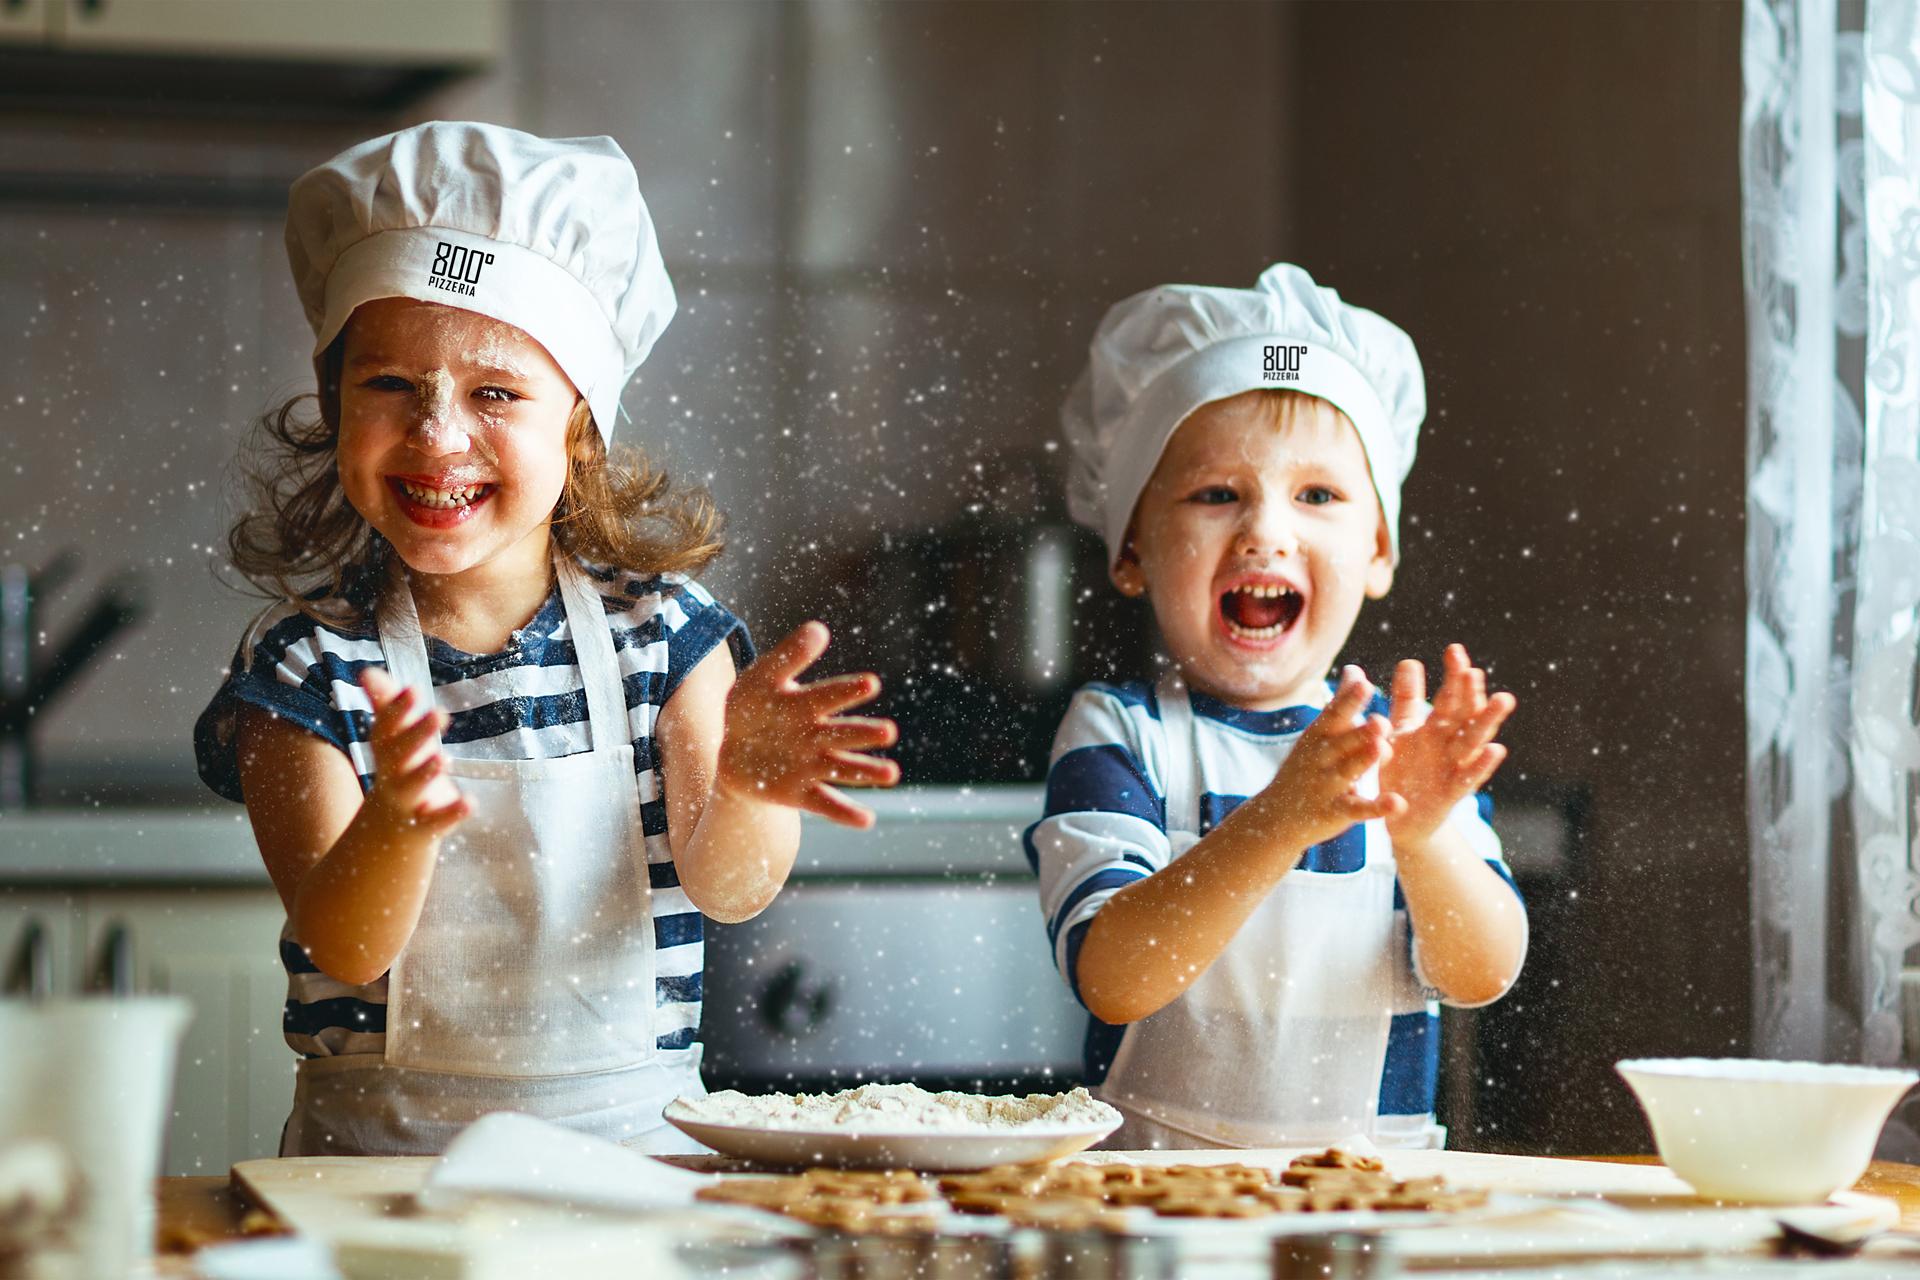 Dubai's 800 Degrees launches kids' pizza making classes